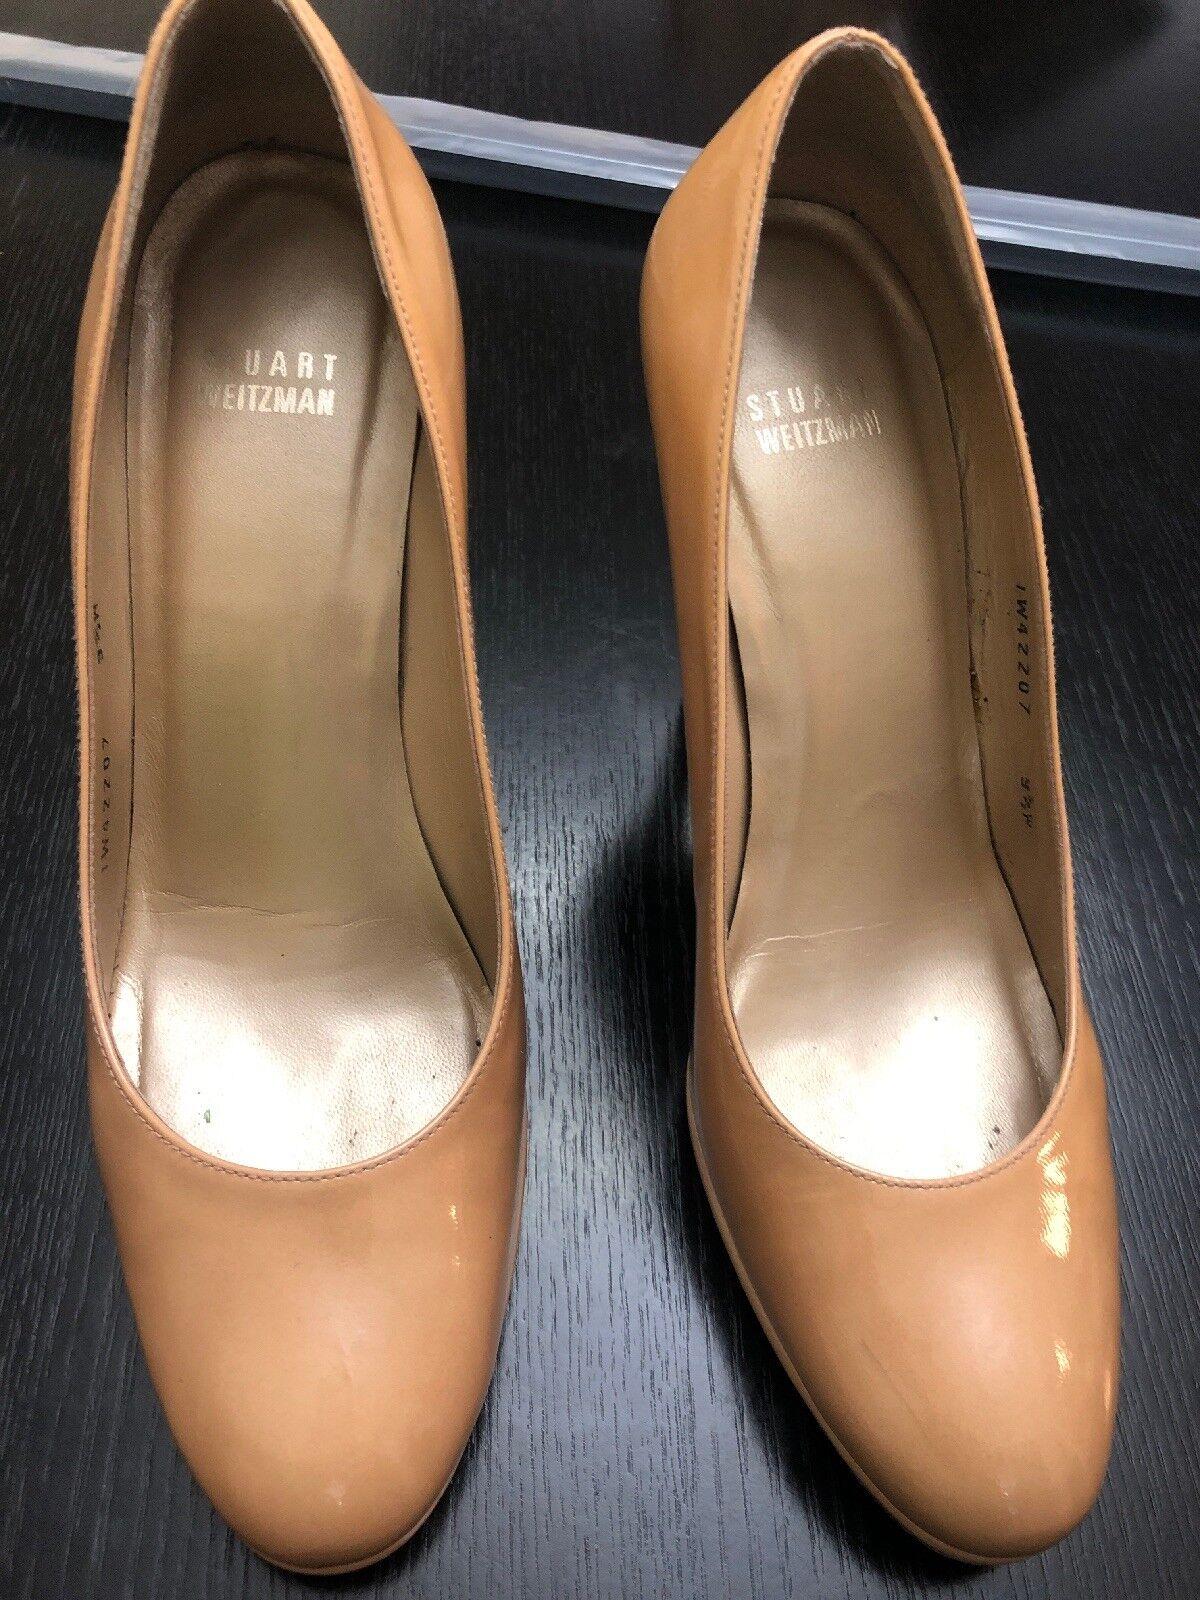 Stuart Weitzman Platswoon Patent Platform Pump, Adobe 9.5 W Women's shoes Tan